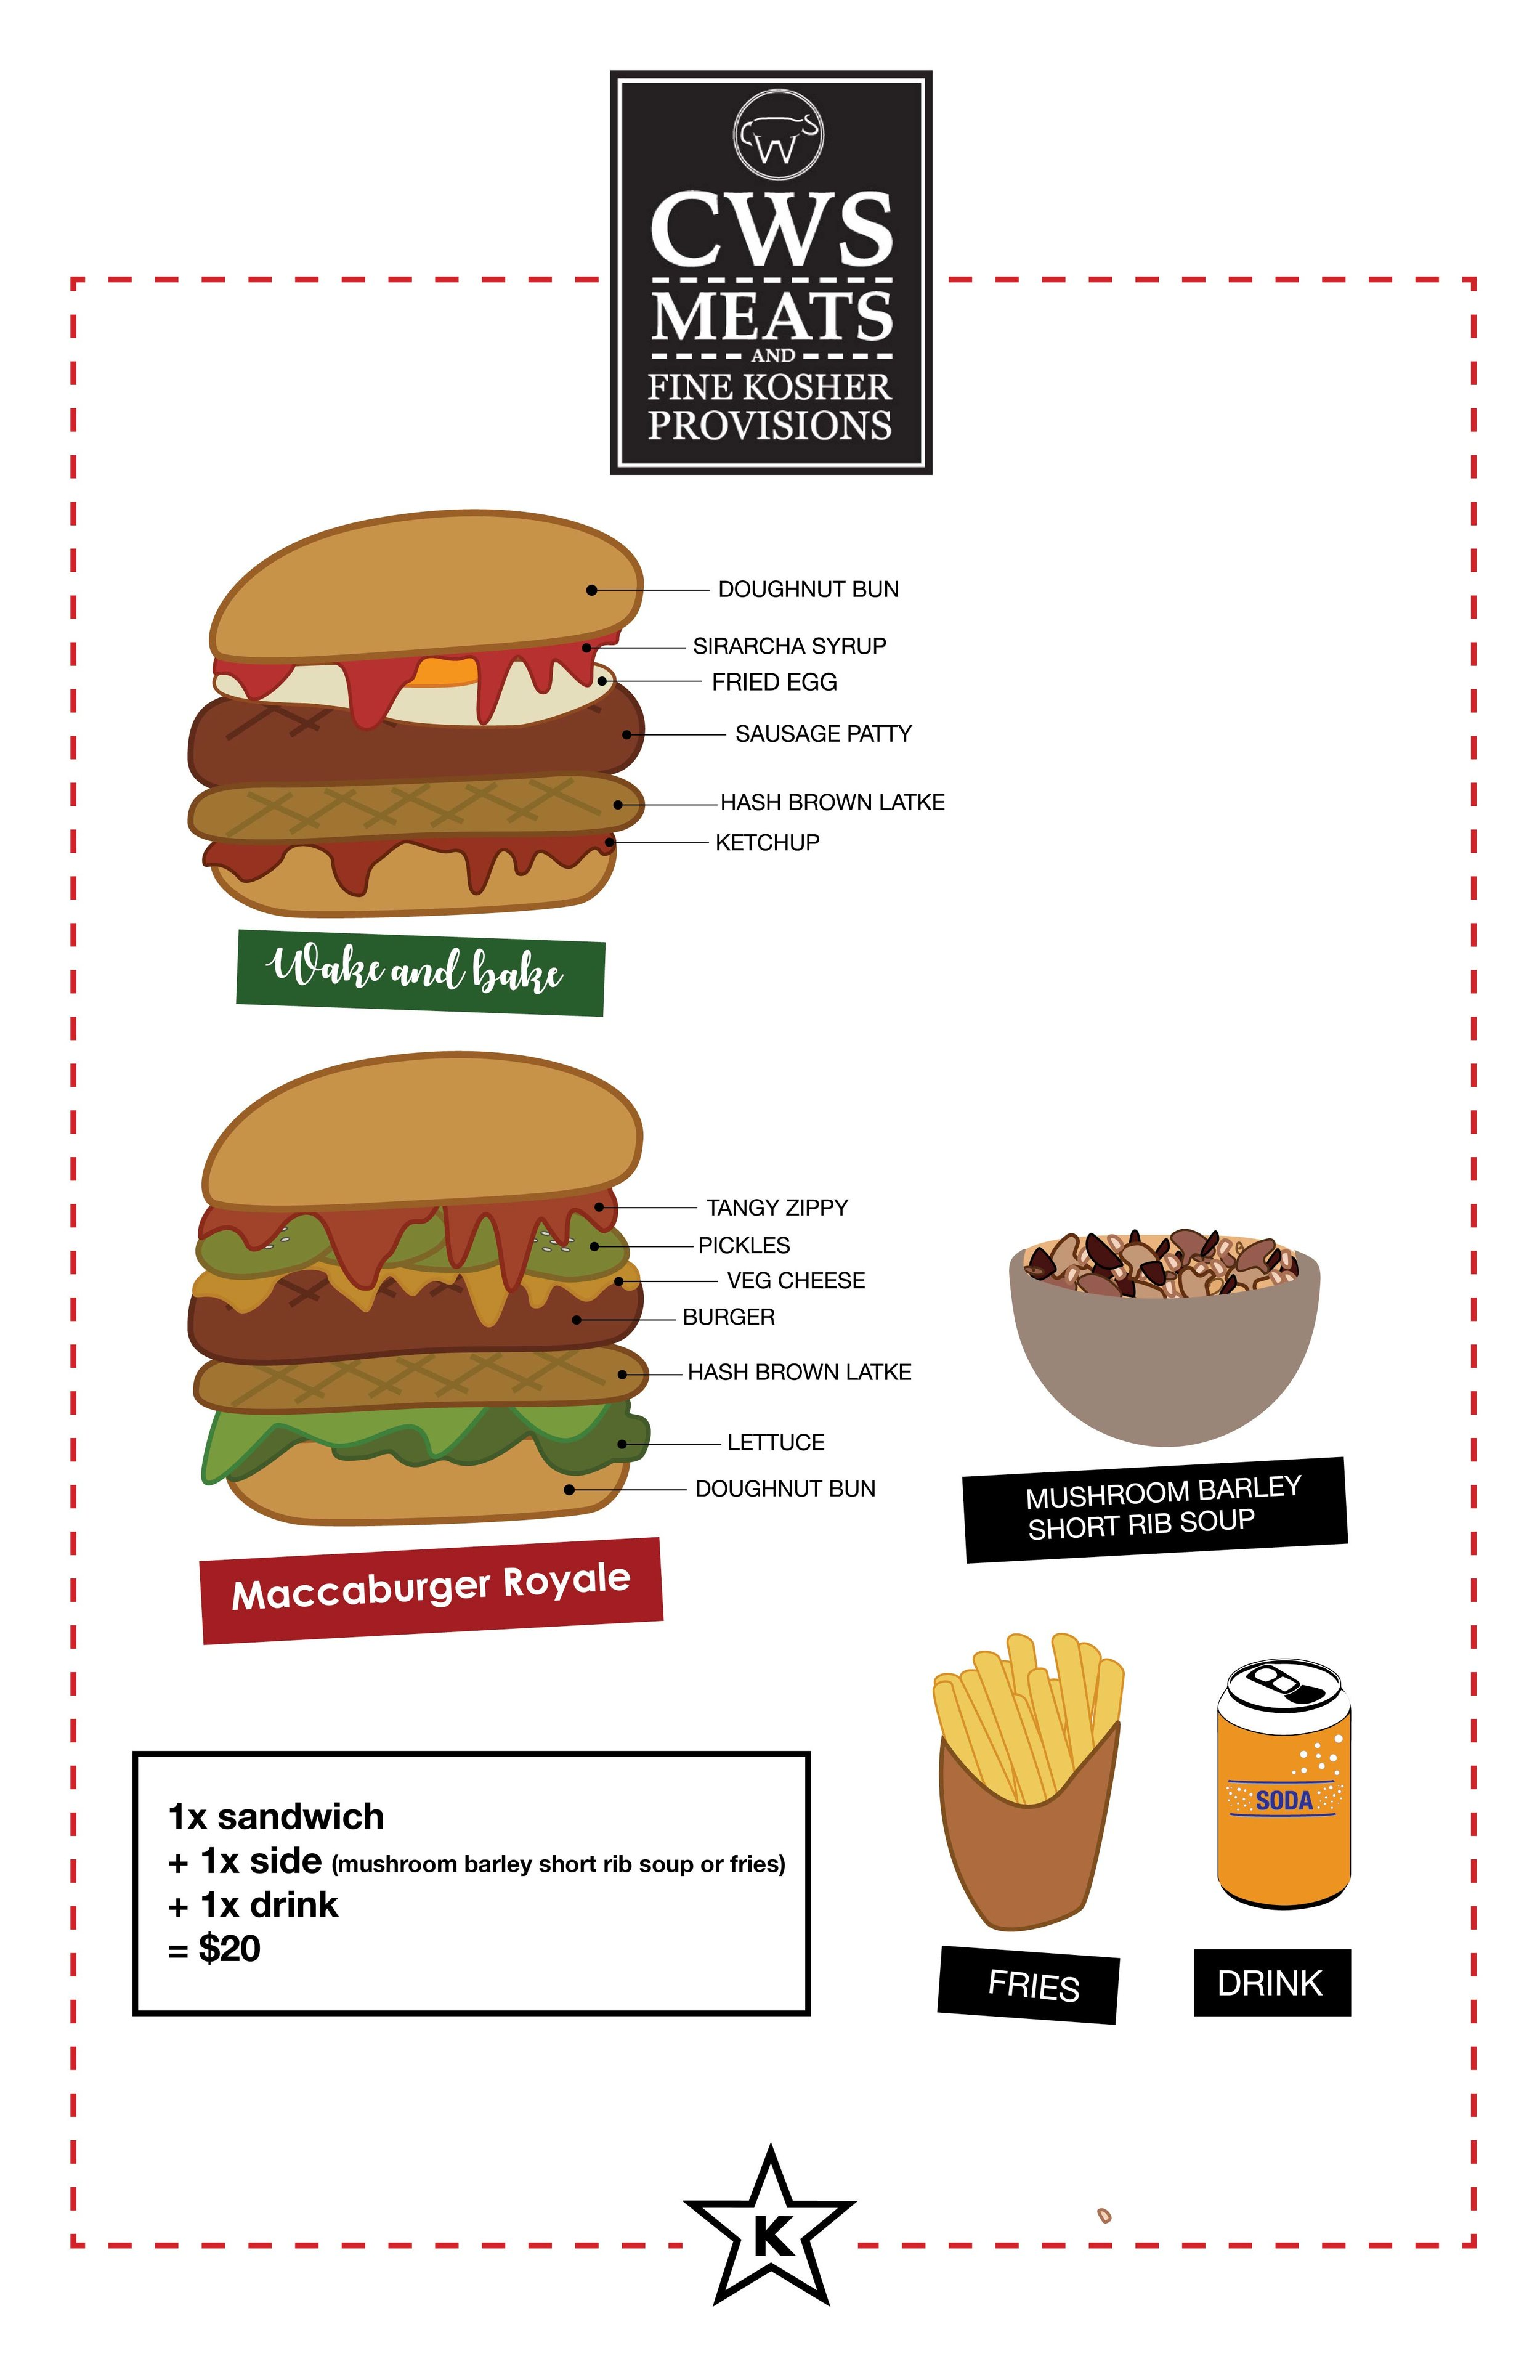 CWS menu 1/1